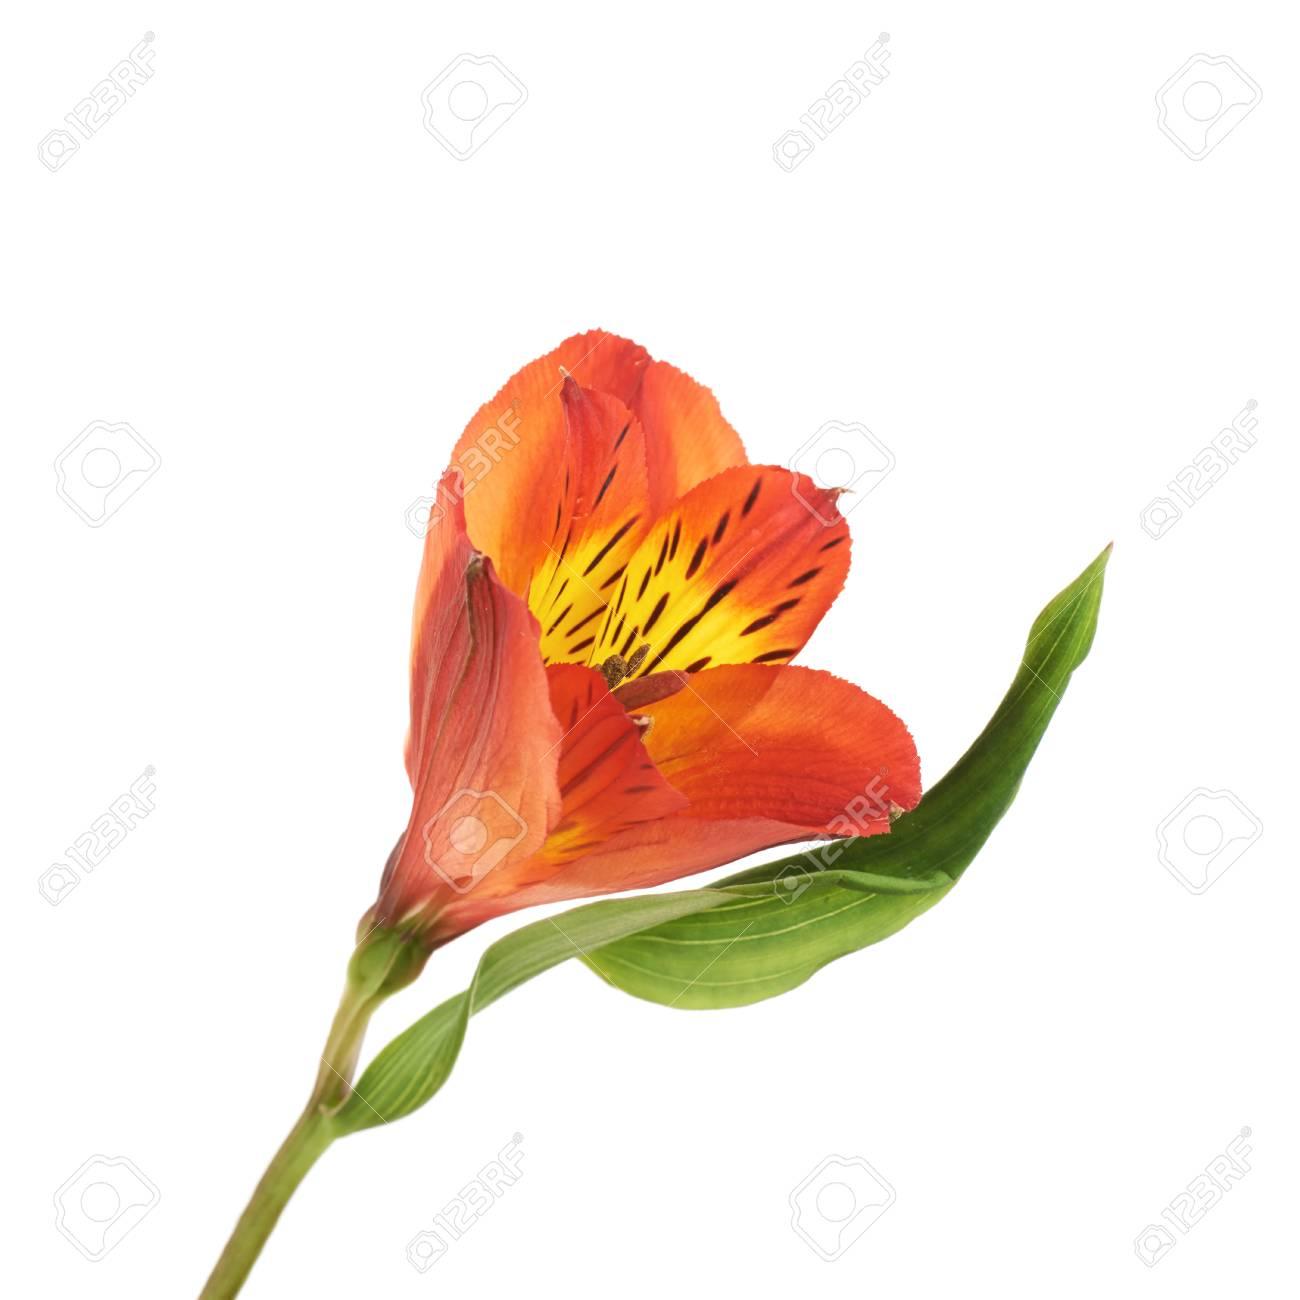 Red alstroemeria or peruvian lily flower isolated over the white red alstroemeria or peruvian lily flower isolated over the white background stock photo 93871989 izmirmasajfo